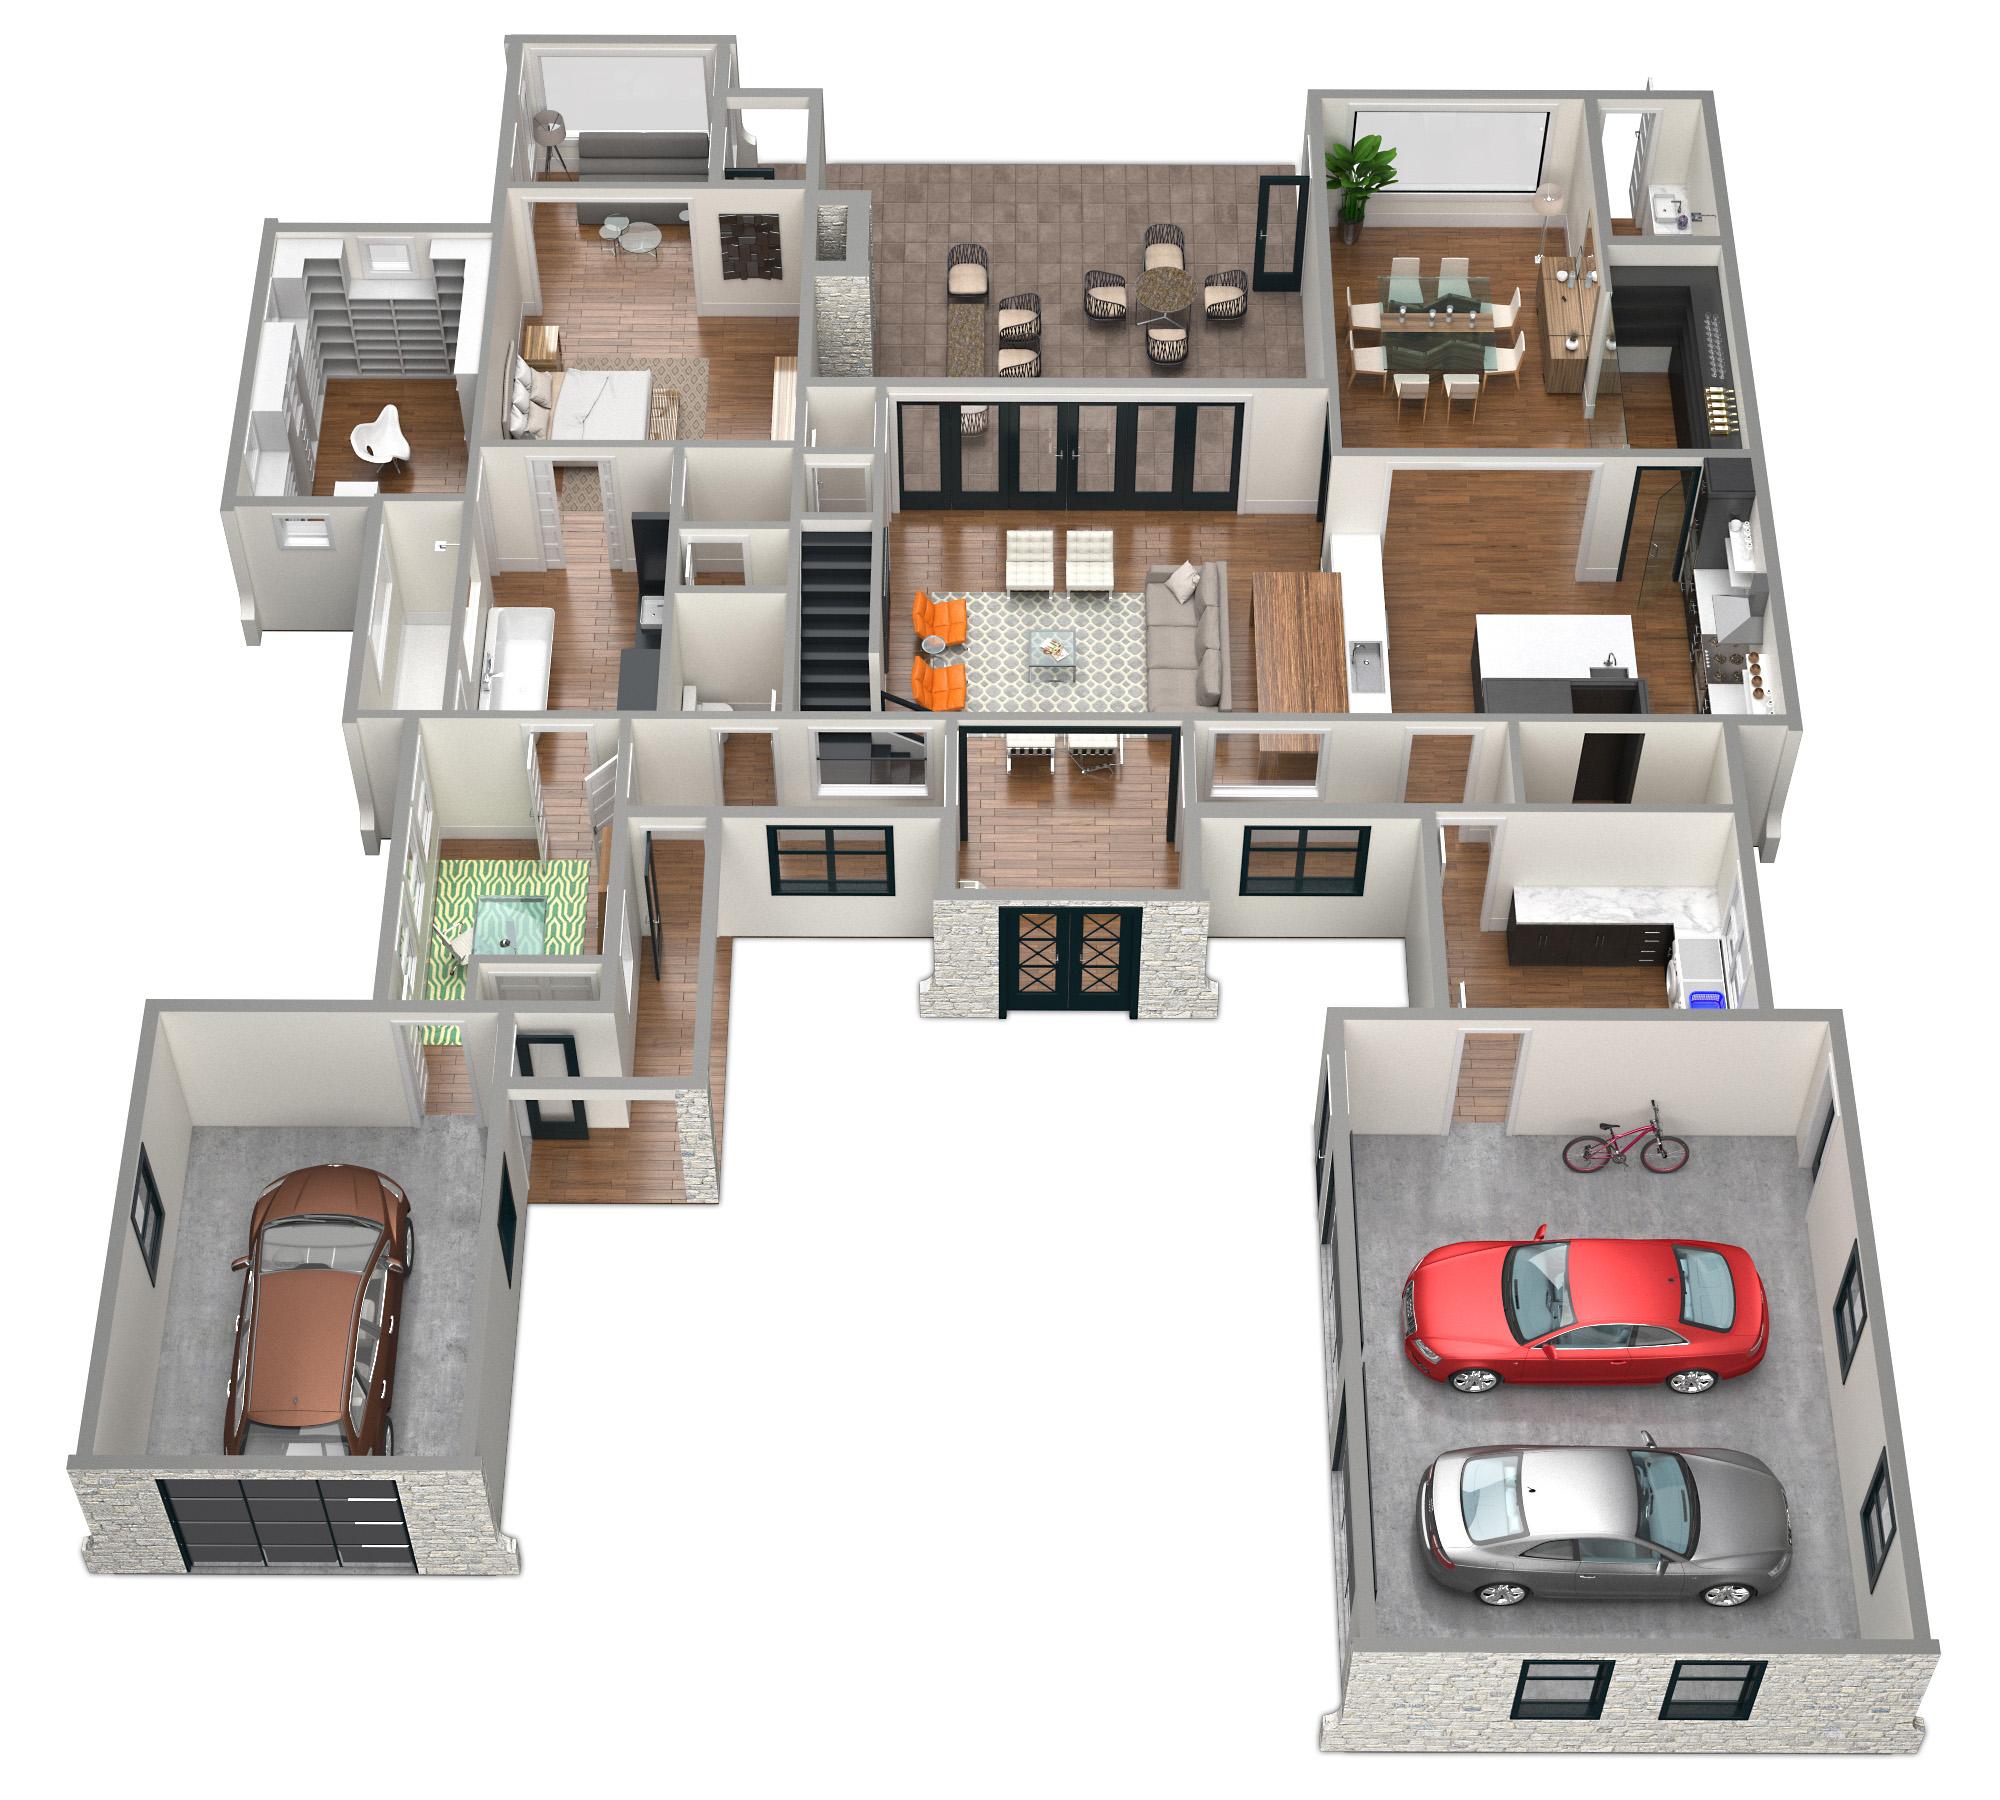 SawyerSound Sounding 1st floor 3D floorplan by Tsymbals